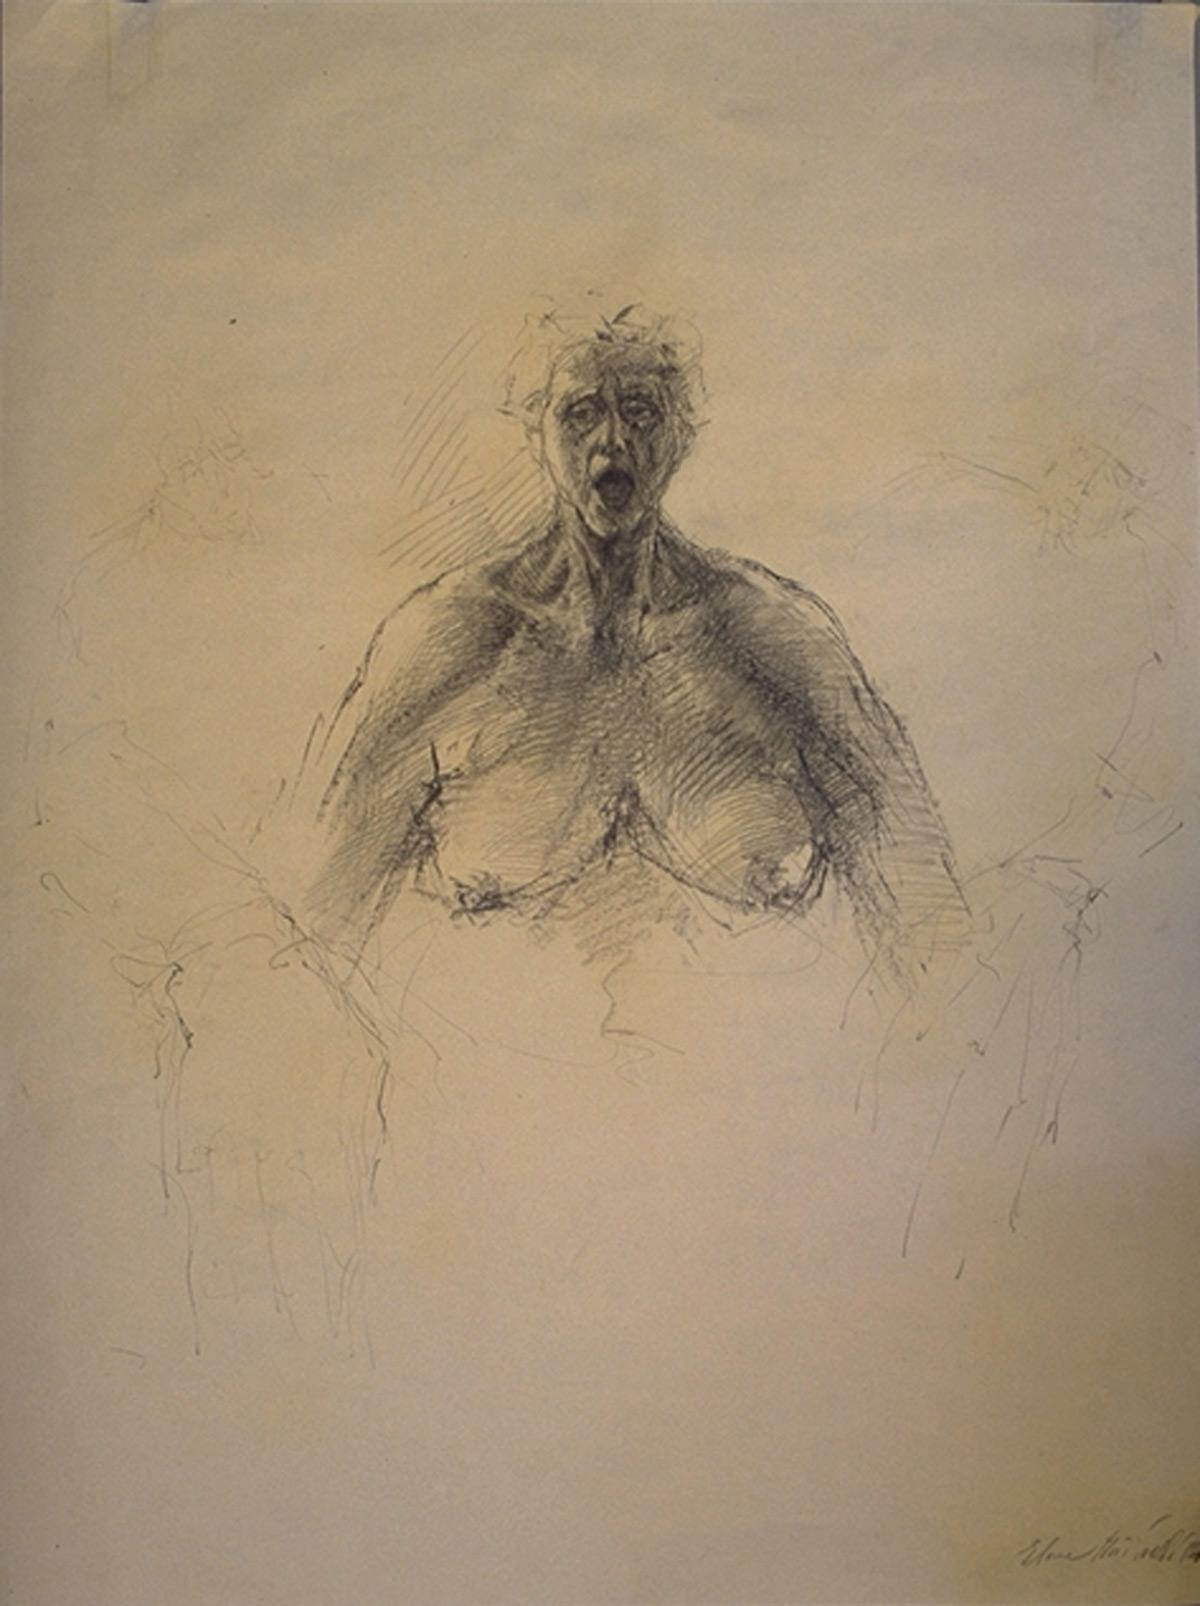 Elena-Mutinelli-31-etra-studio-tommasi